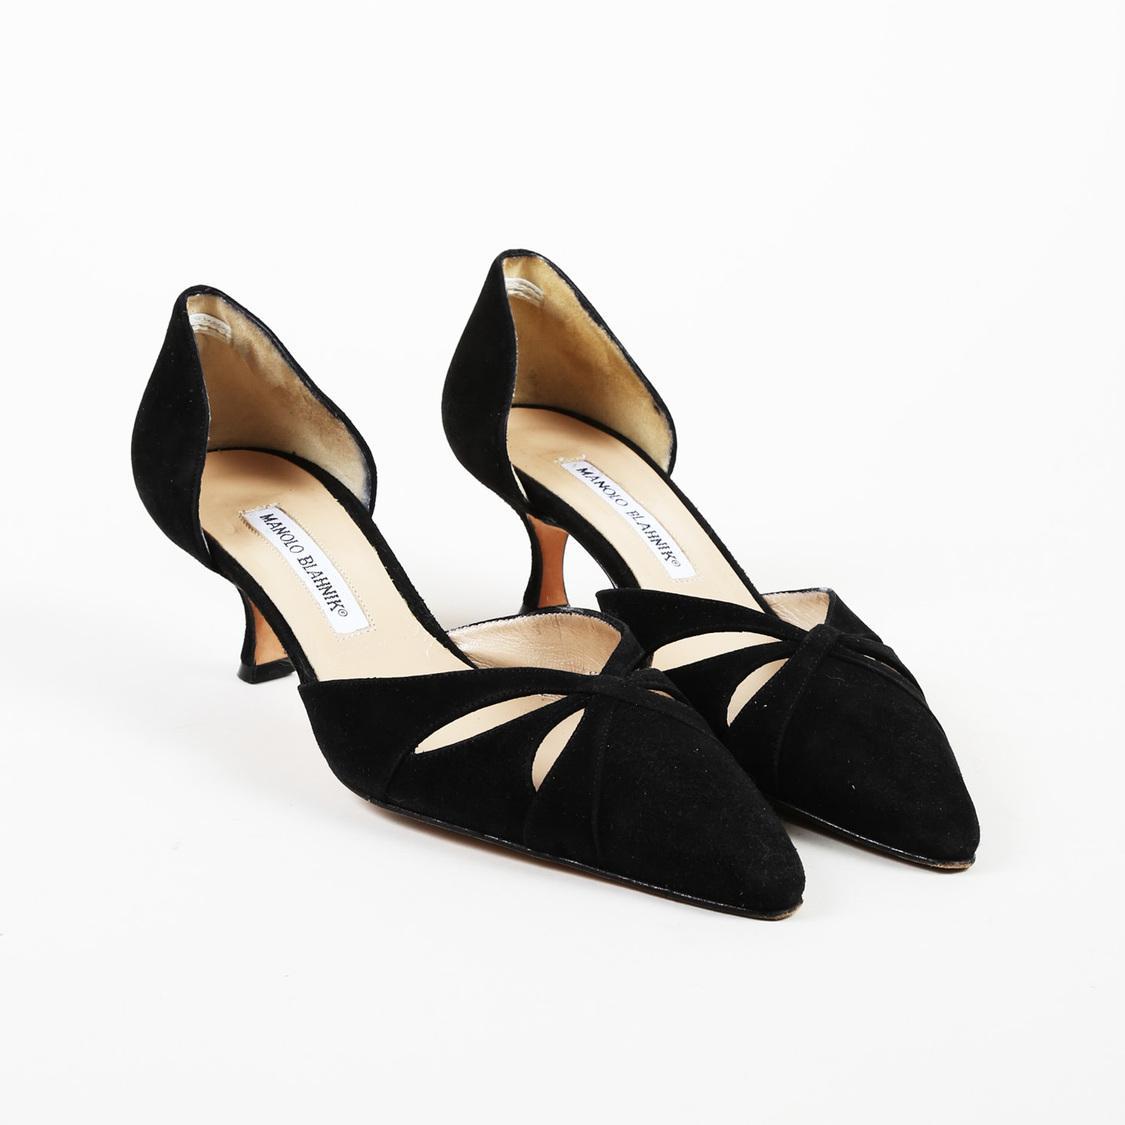 8a756526087 Lyst - Manolo Blahnik Black Suede Kitten Heel Pointed D orsay Pumps ...